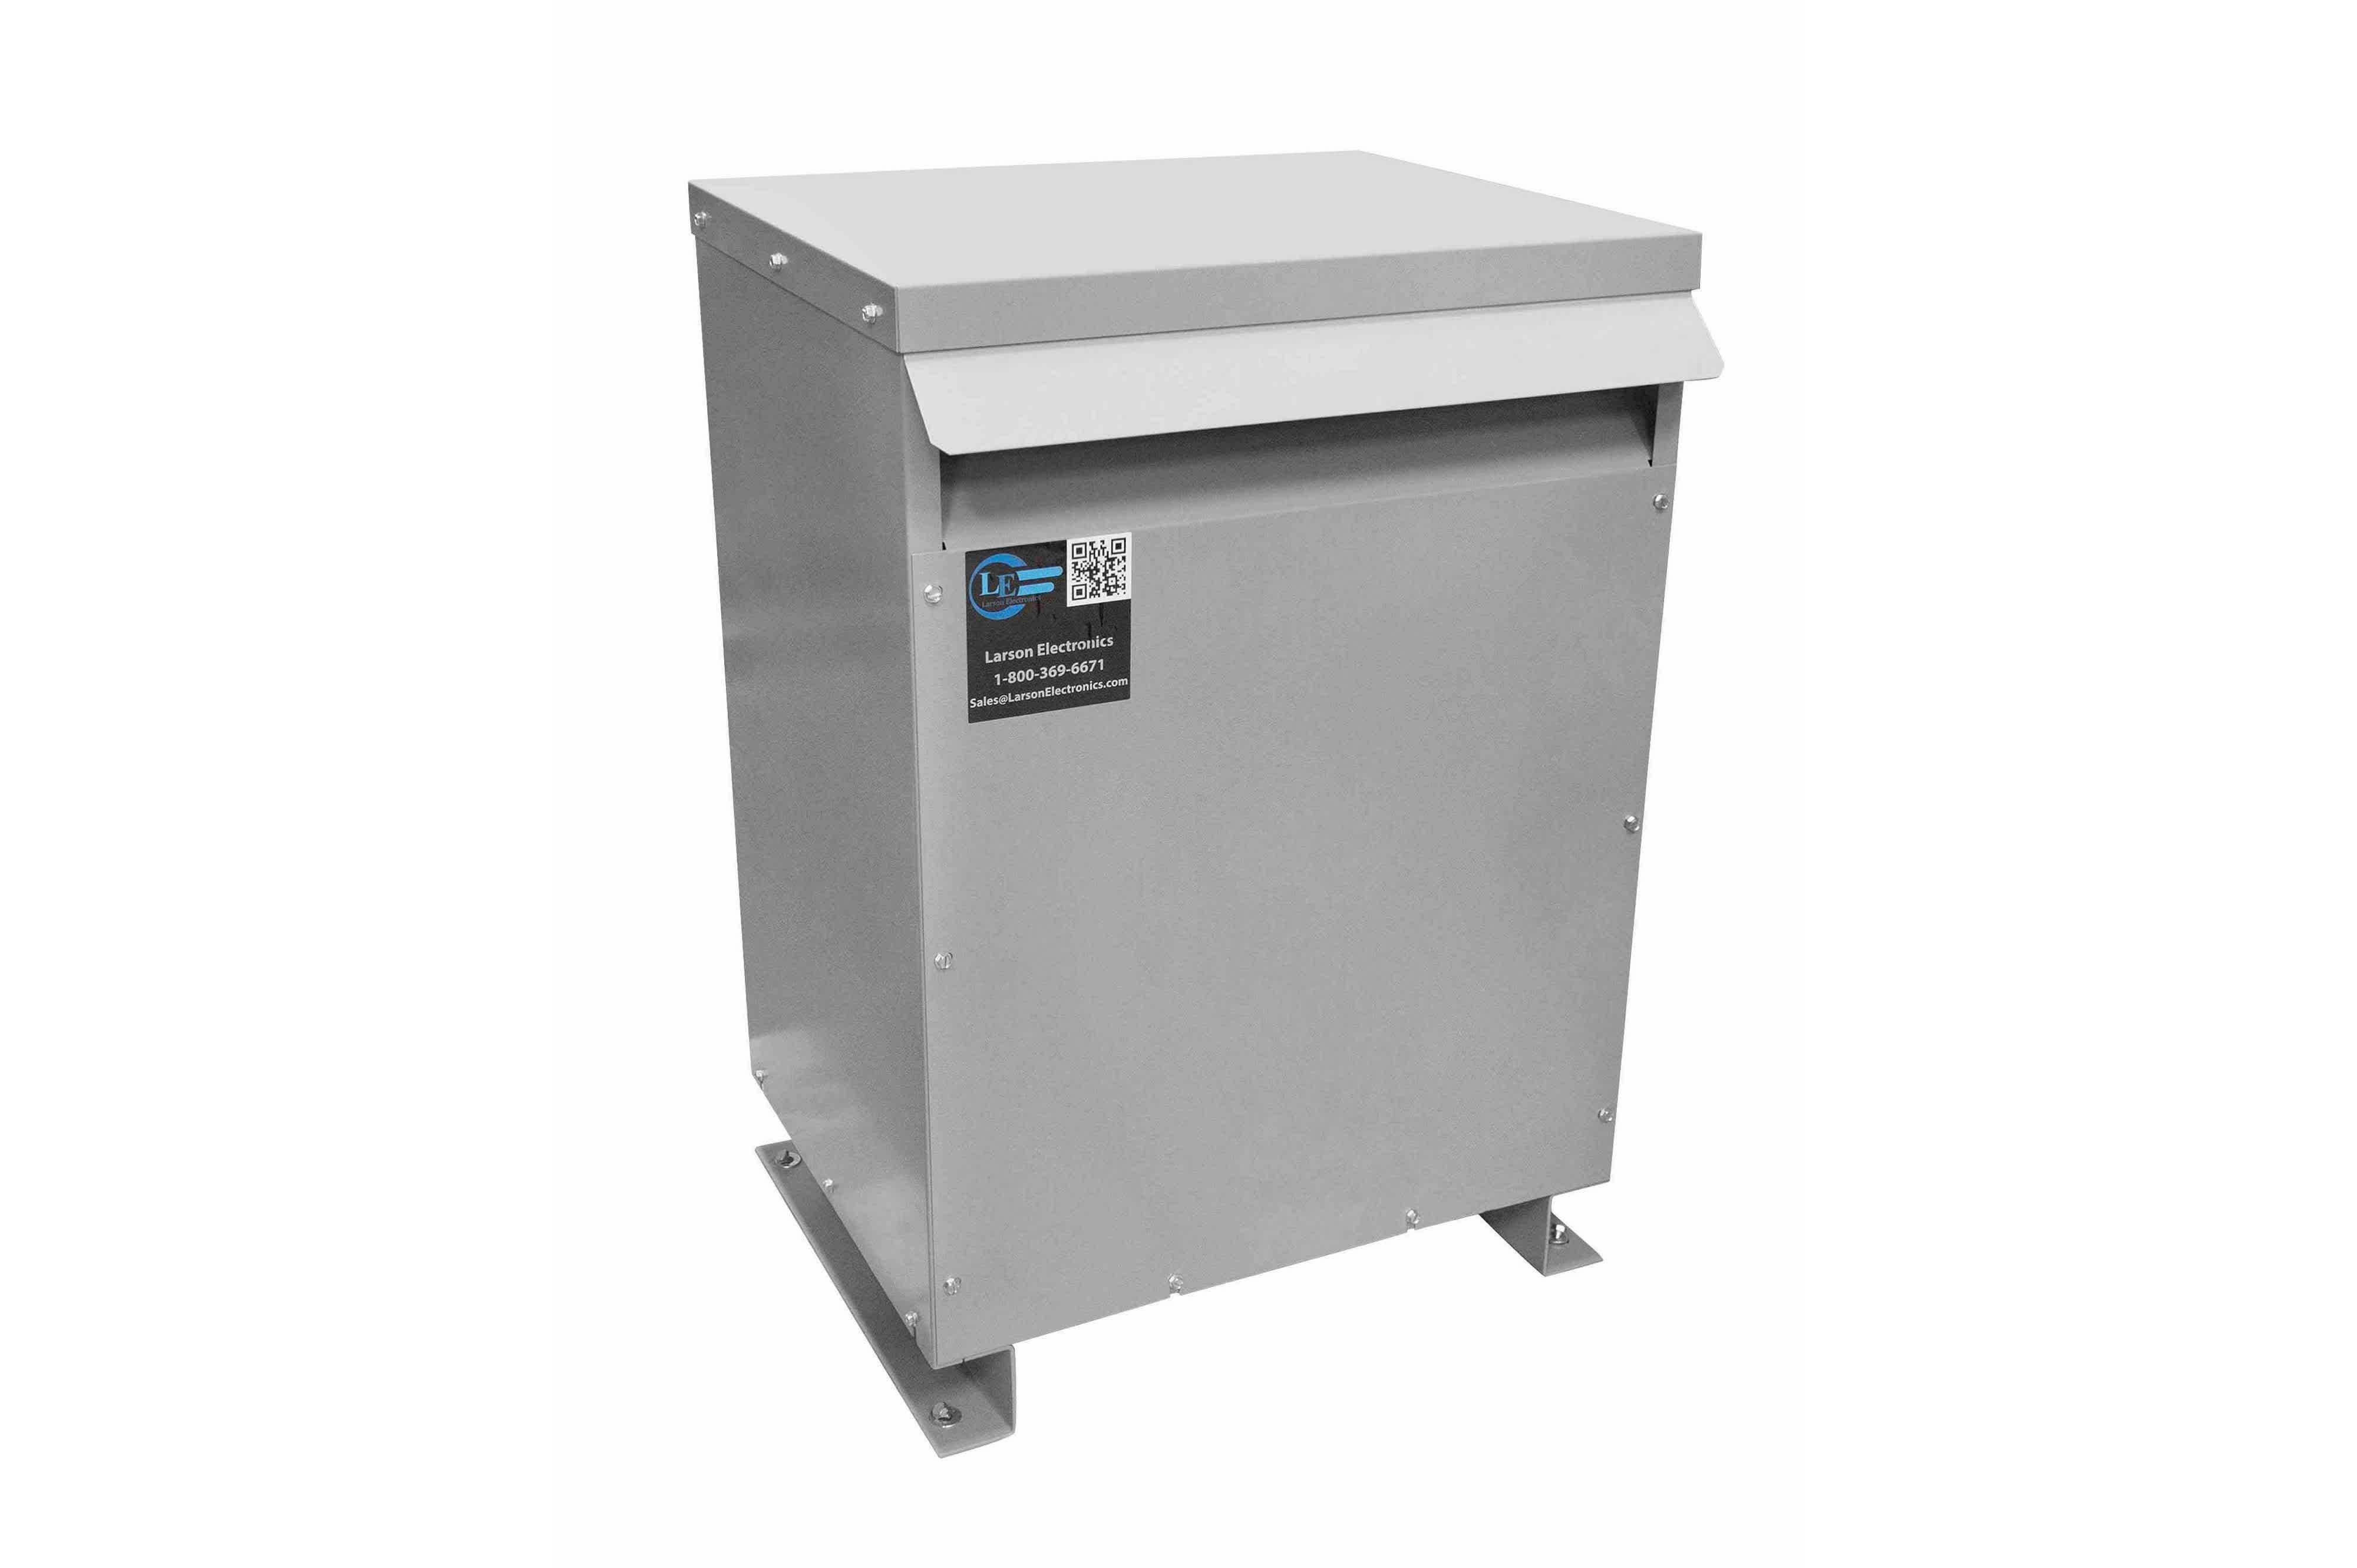 14 kVA 3PH Isolation Transformer, 240V Wye Primary, 208V Delta Secondary, N3R, Ventilated, 60 Hz